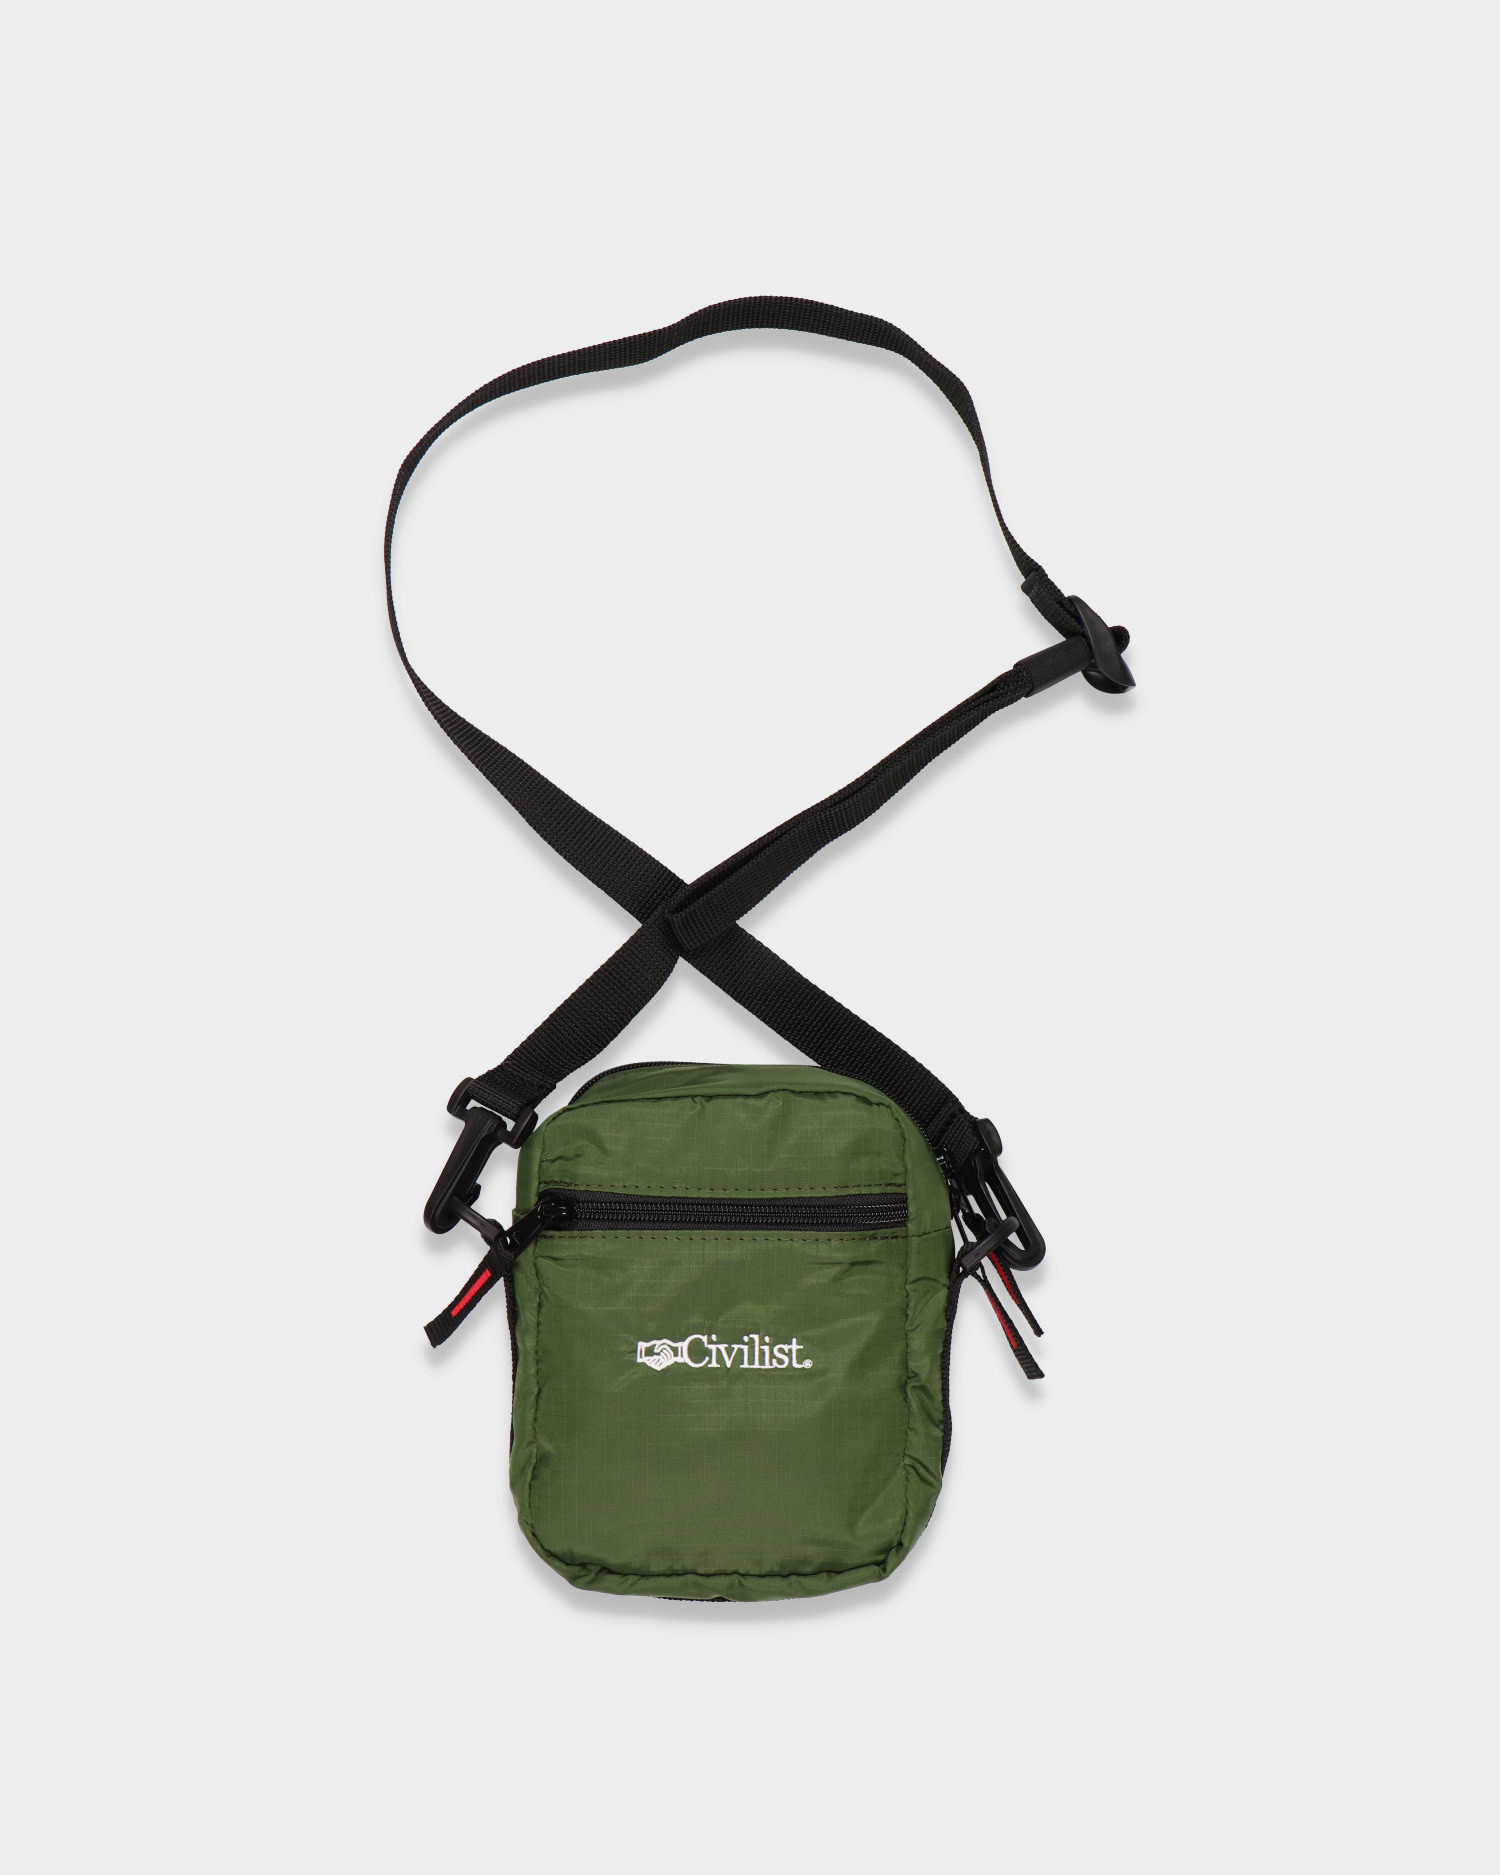 Civilist Pusher Bag Green